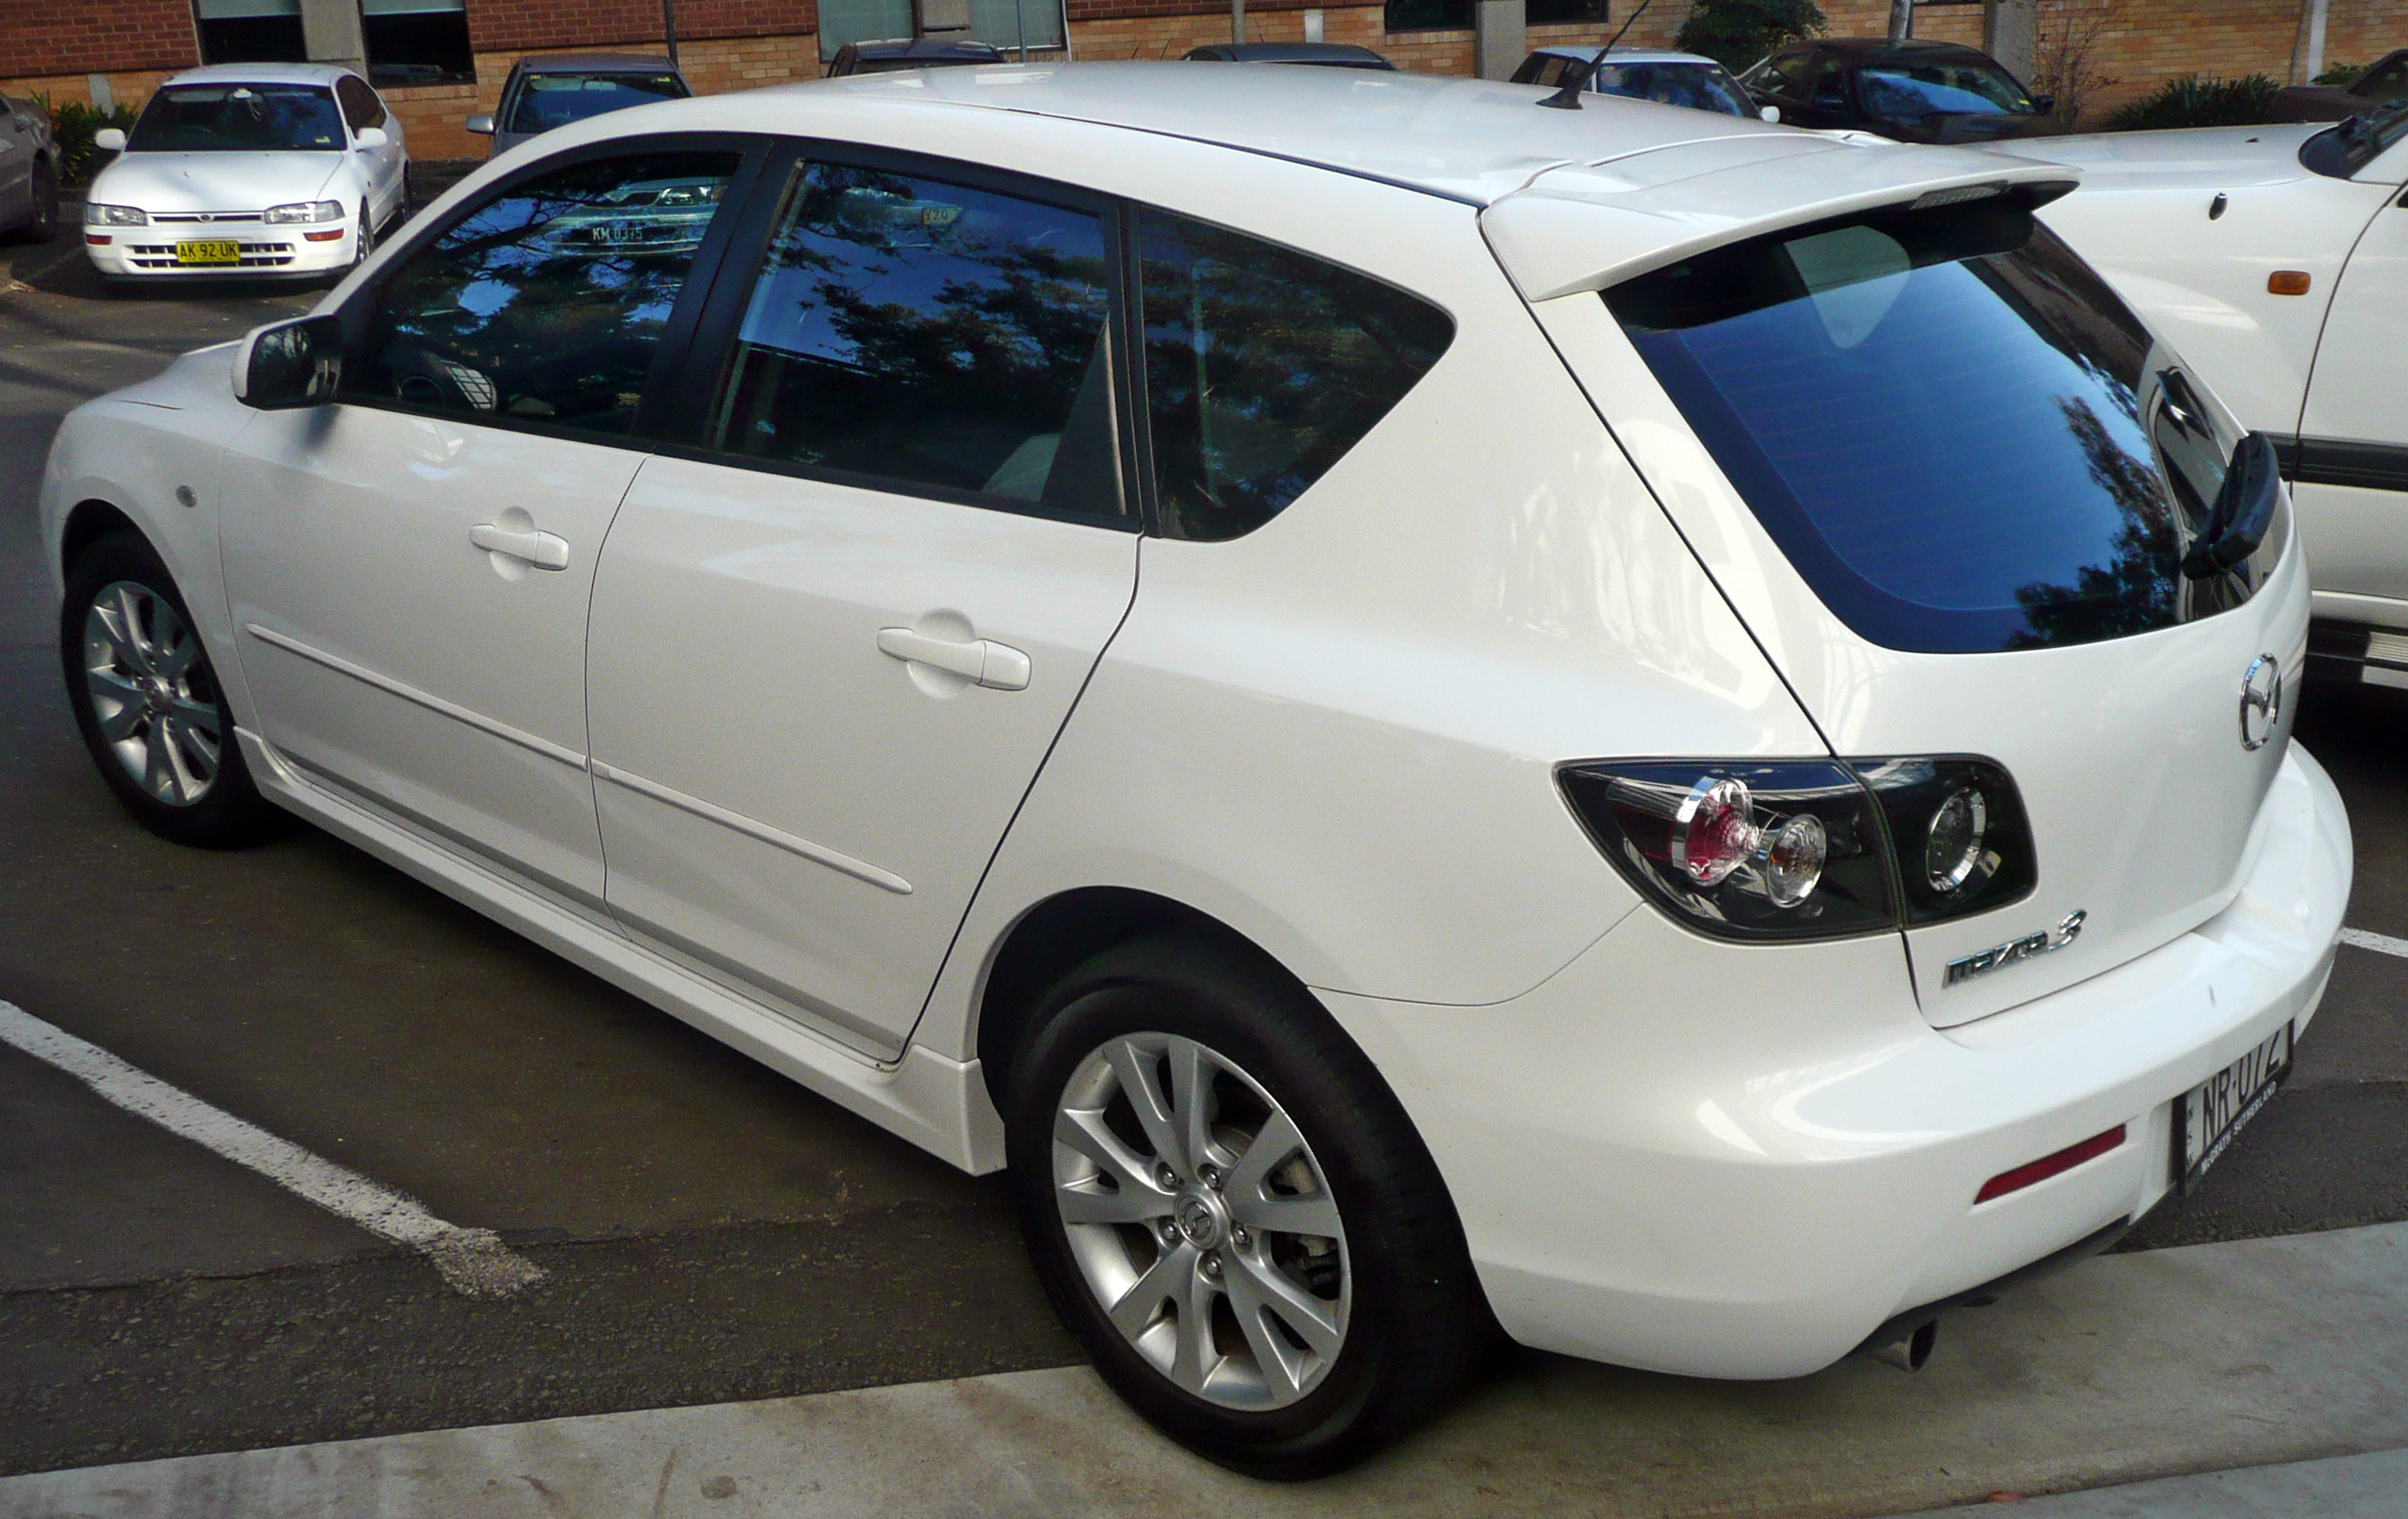 File:2006 2008 Mazda 3 (BK Series 2) Maxx Sport Hatchback 01